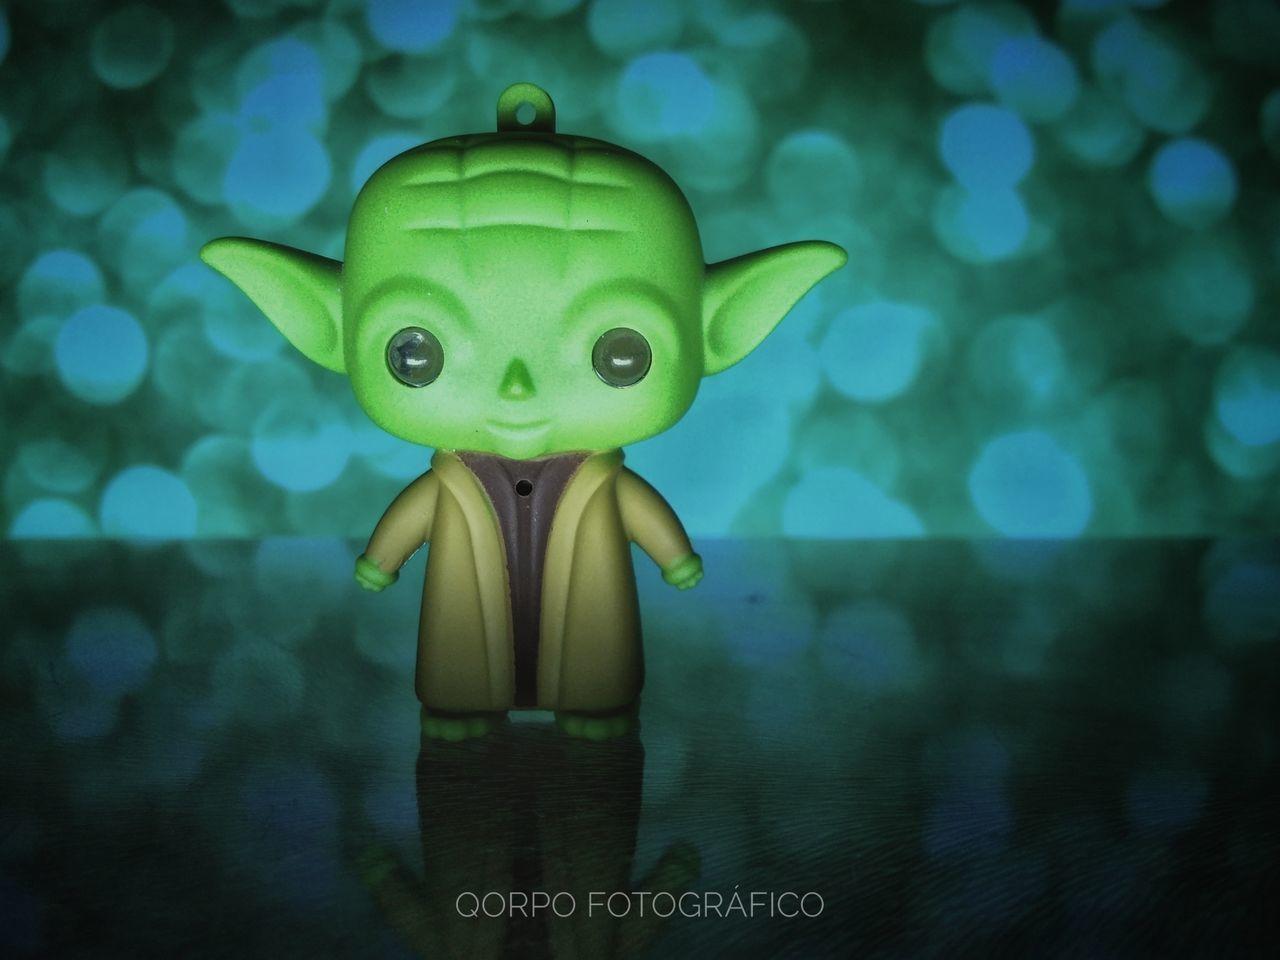 MayTheForceBeWithyou MayThe4thBeWithYou Guerra Nas Estrelas Star Wars Stormtrooper Yoda